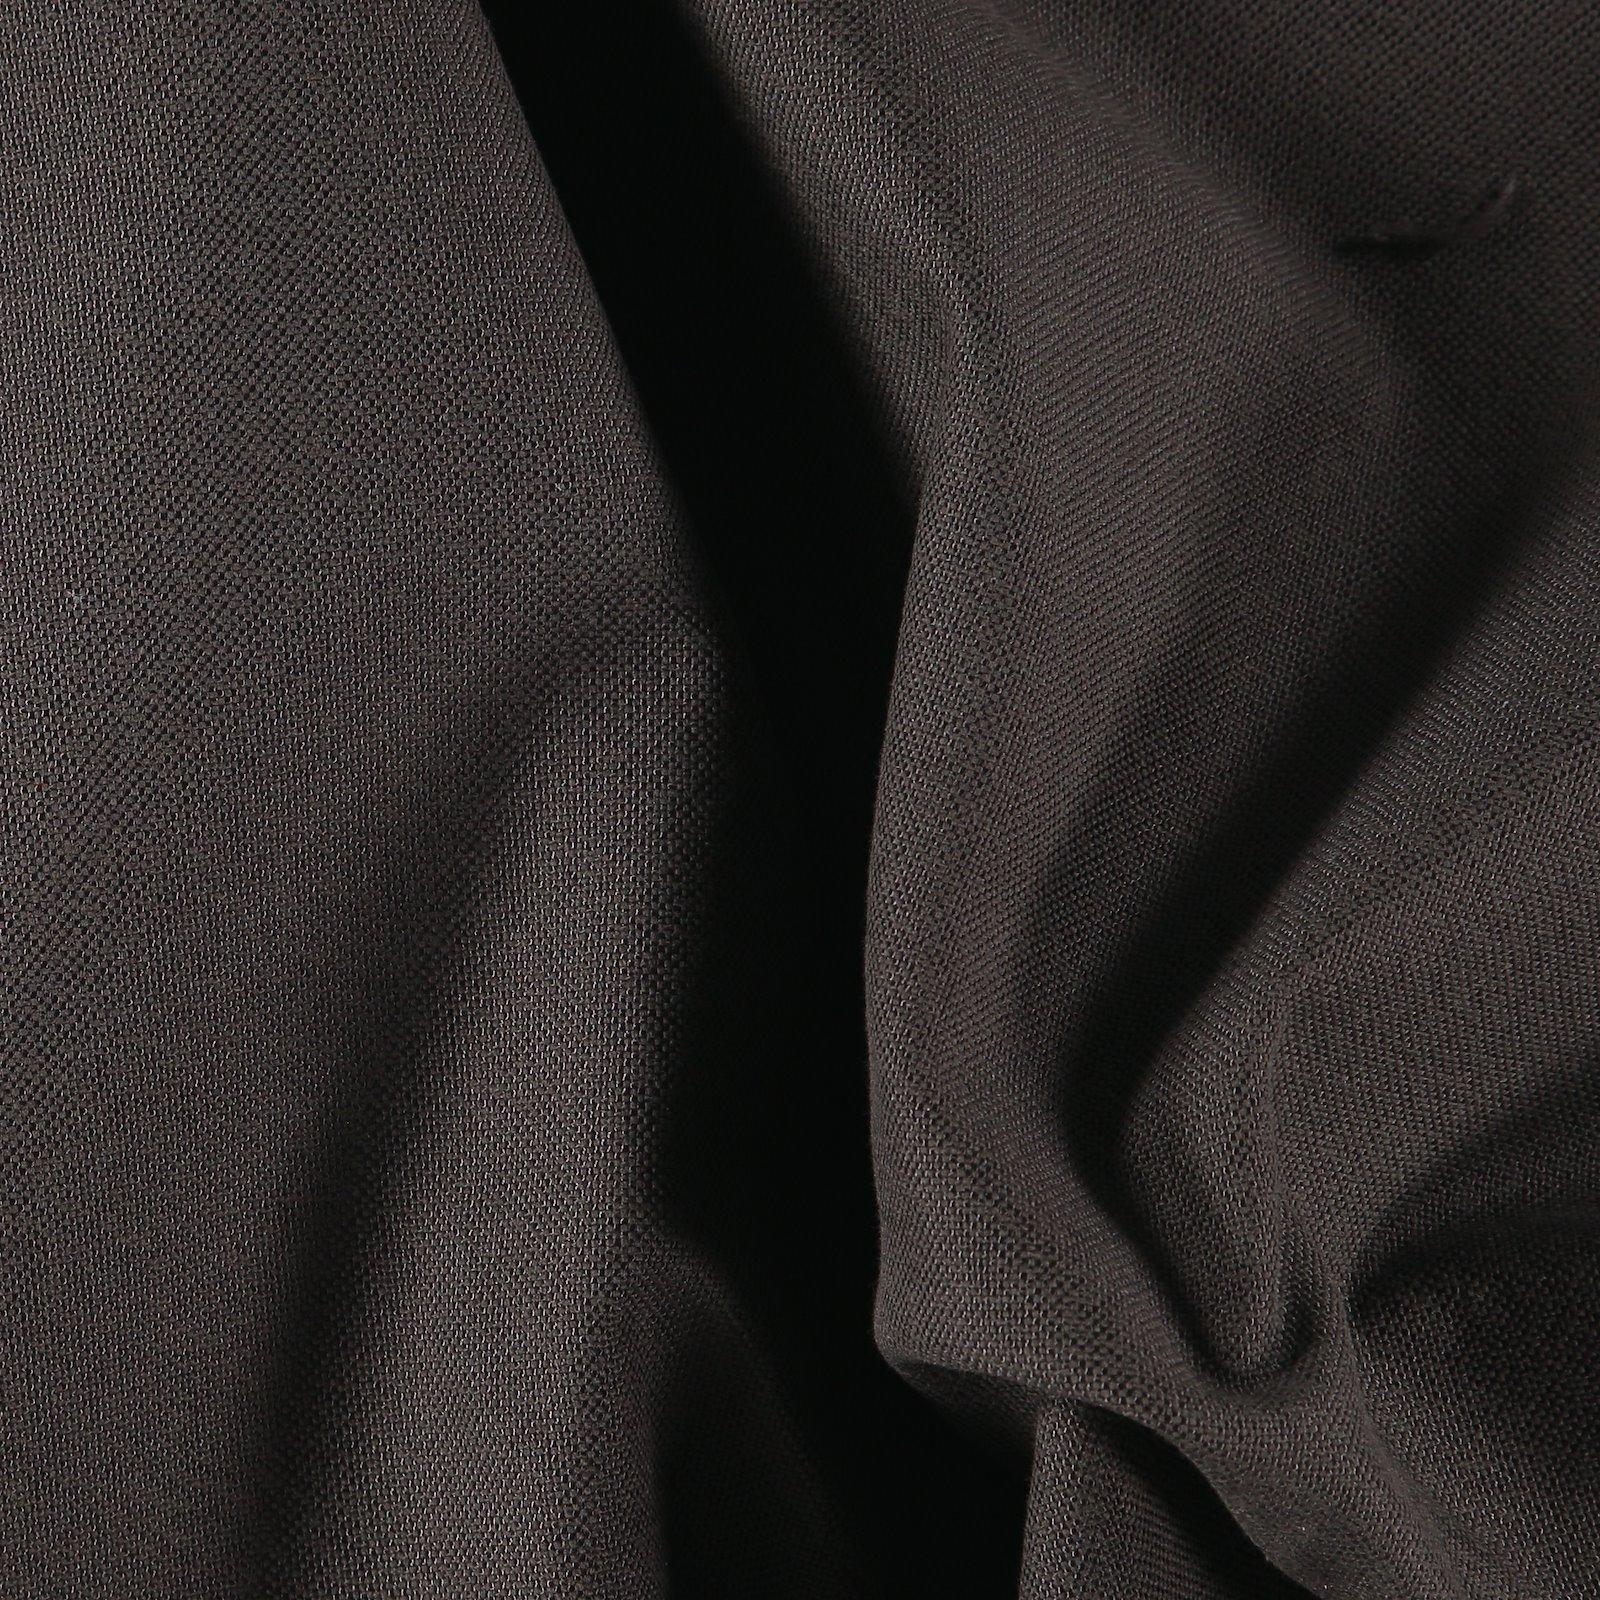 Woven brown